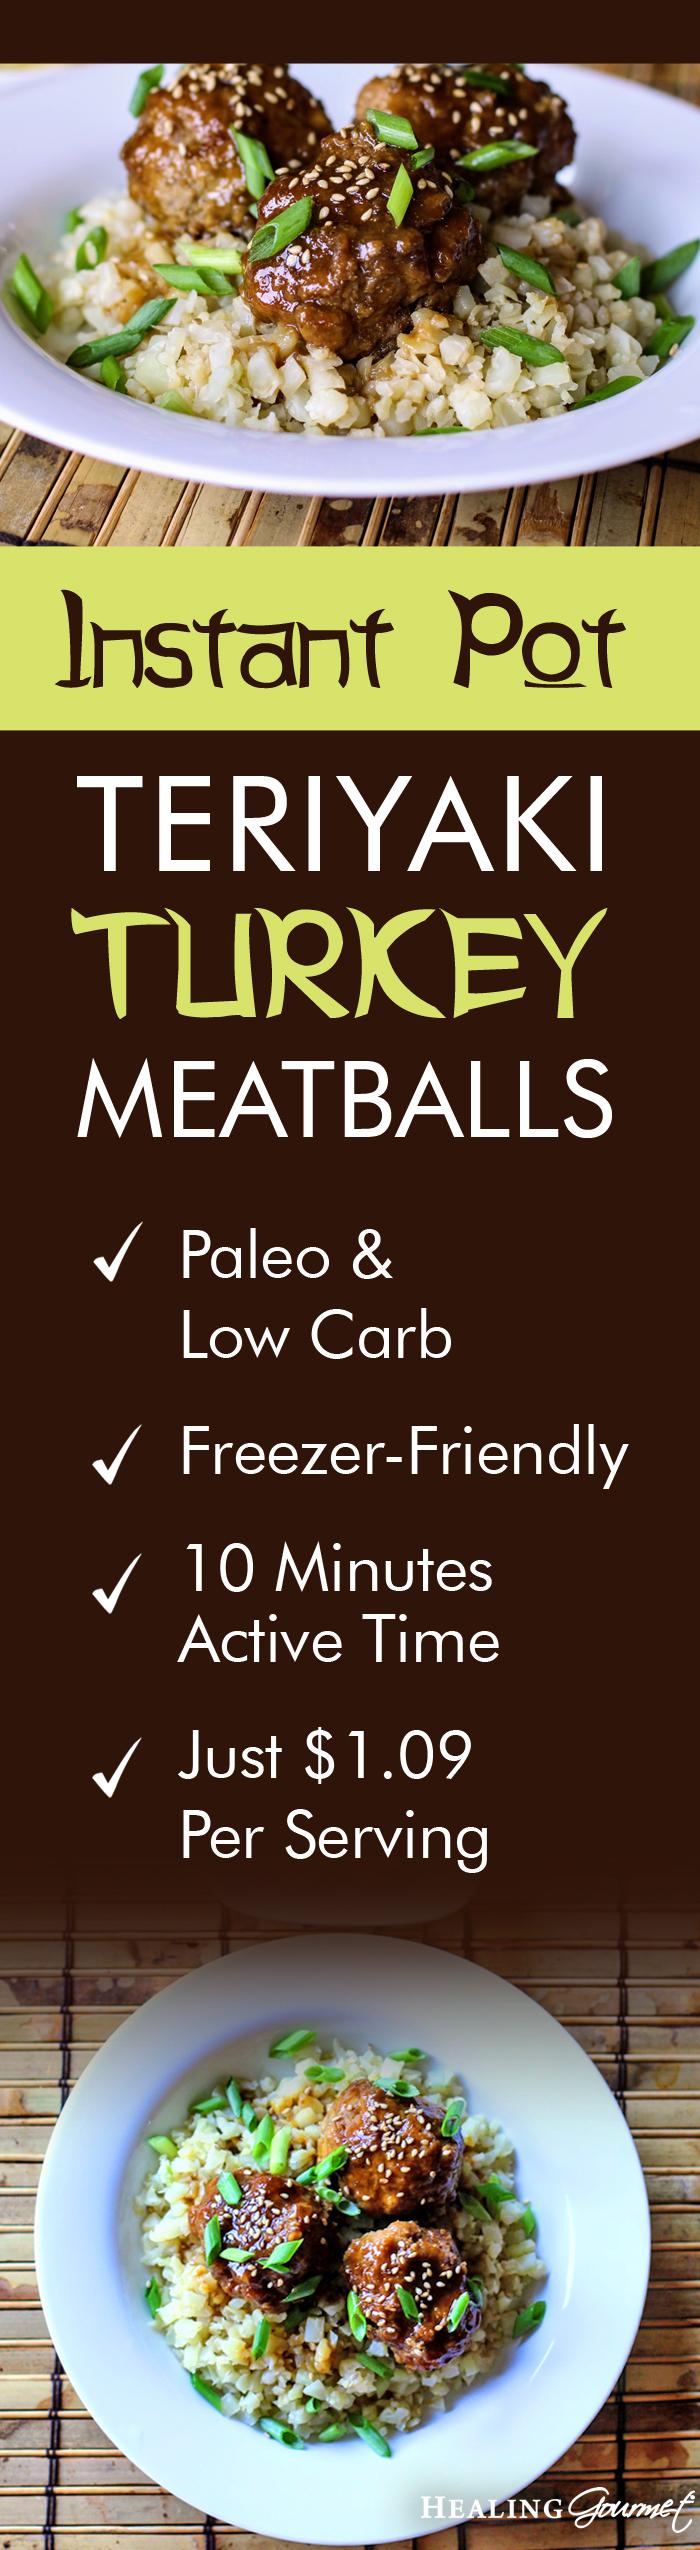 Instant Pot Teriyaki Turkey Meatballs